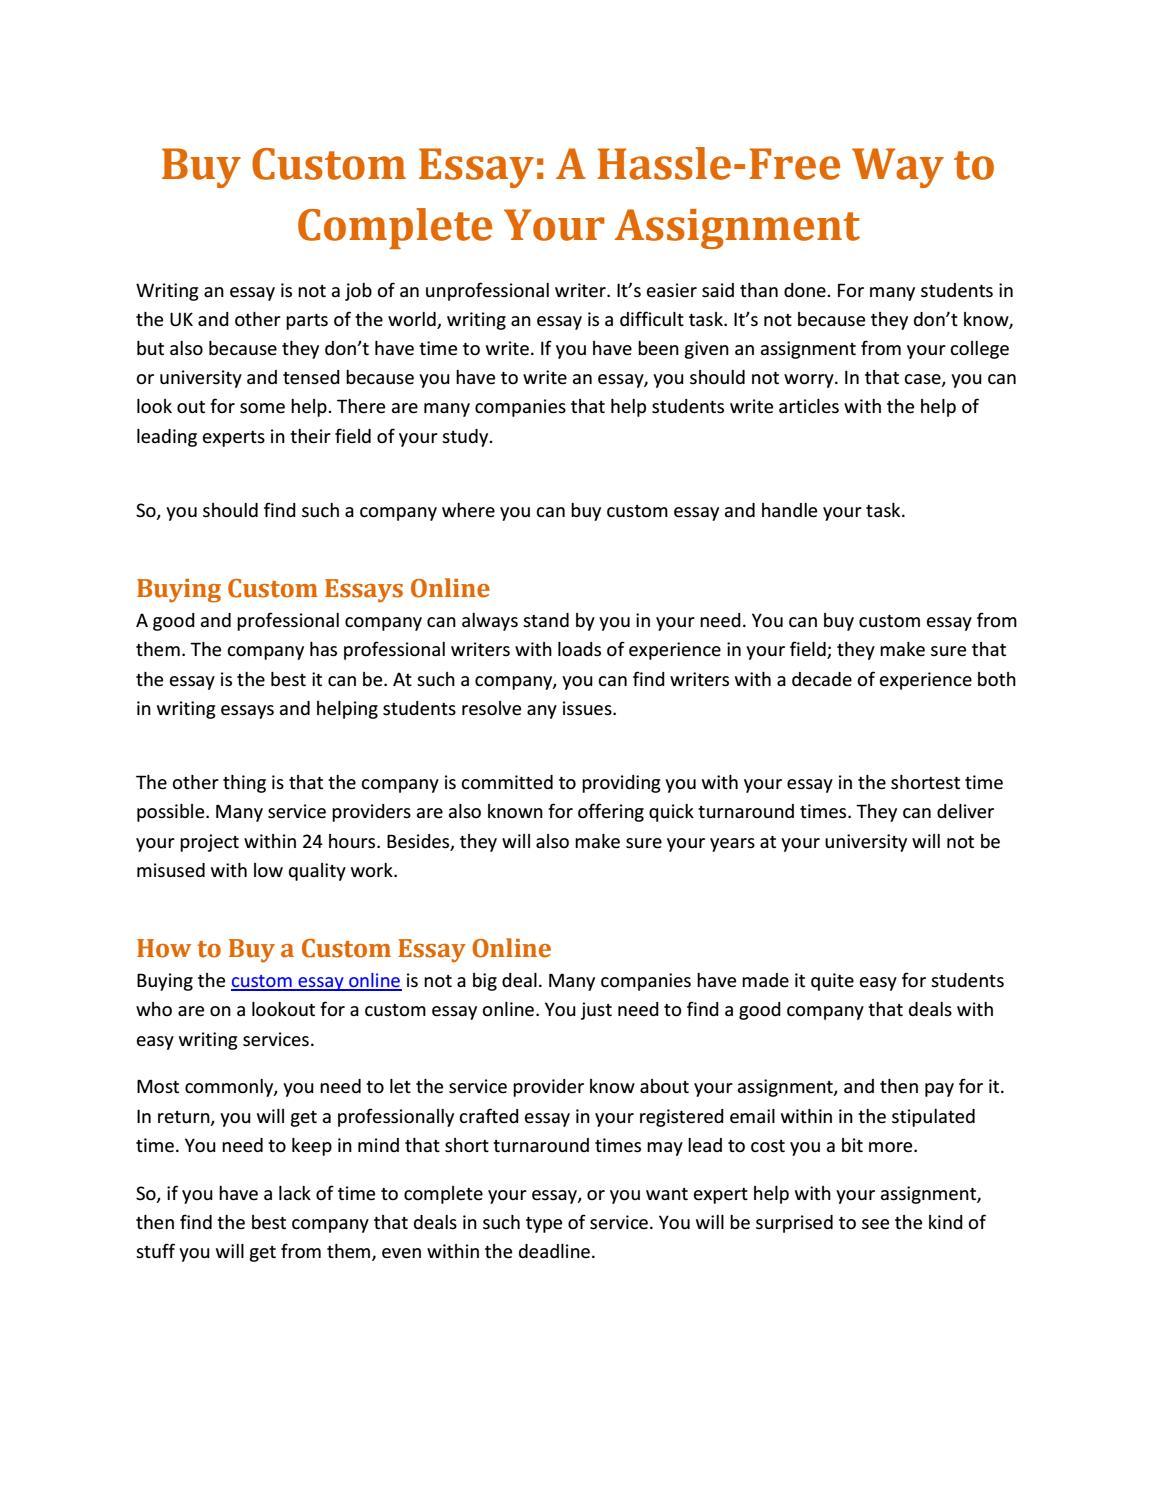 001 Page 1 Buy Custom Essays Online Essay Impressive Full